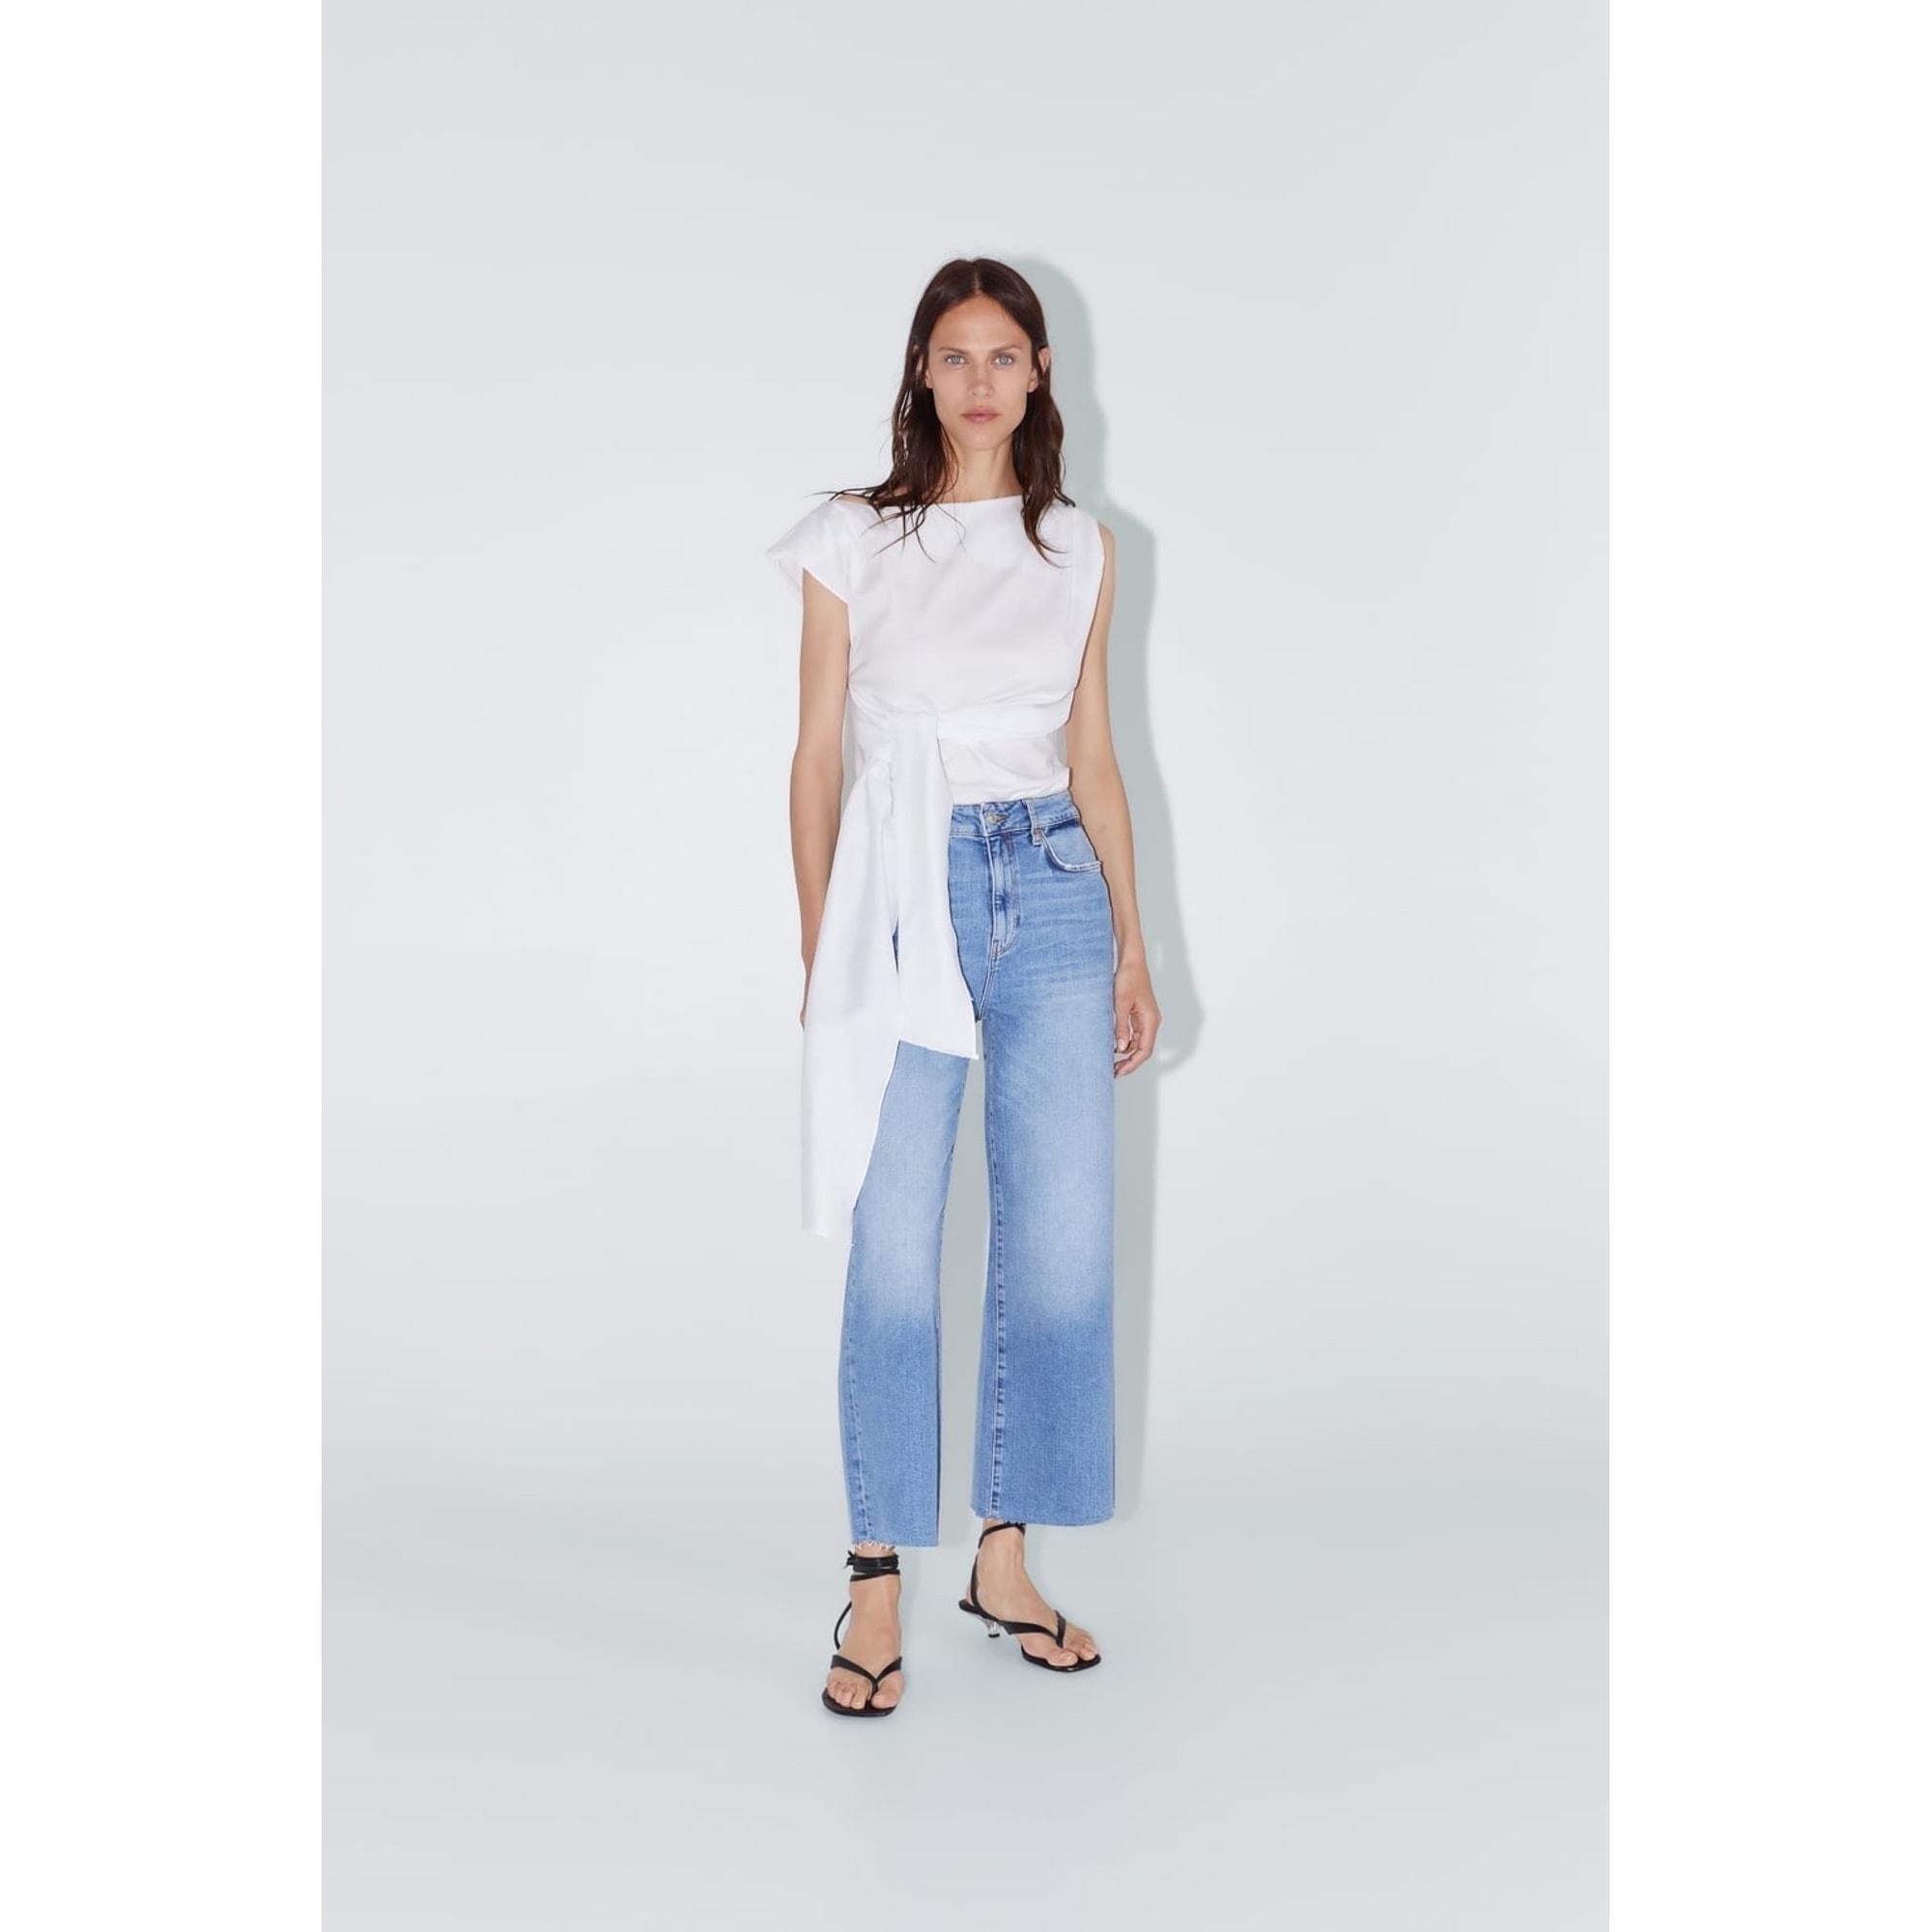 Jeans large, boyfriend ZARA Bleu, bleu marine, bleu turquoise